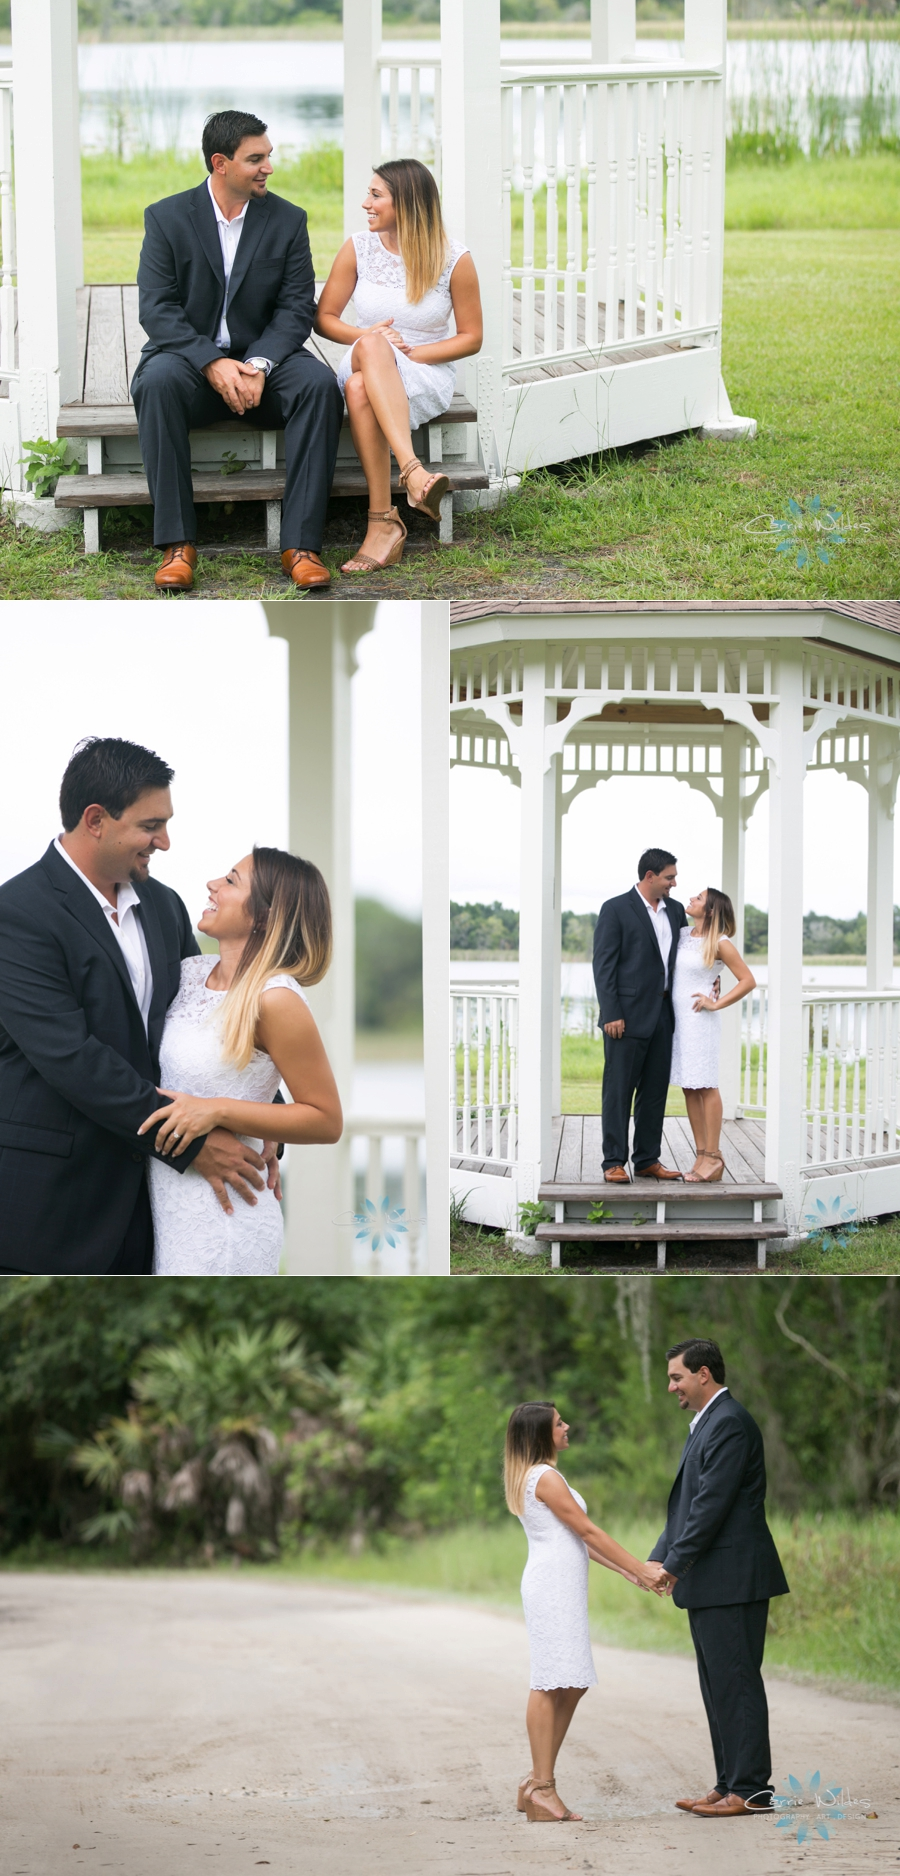 7_23_15 Lake Park Tampa Engagement_0006.jpg